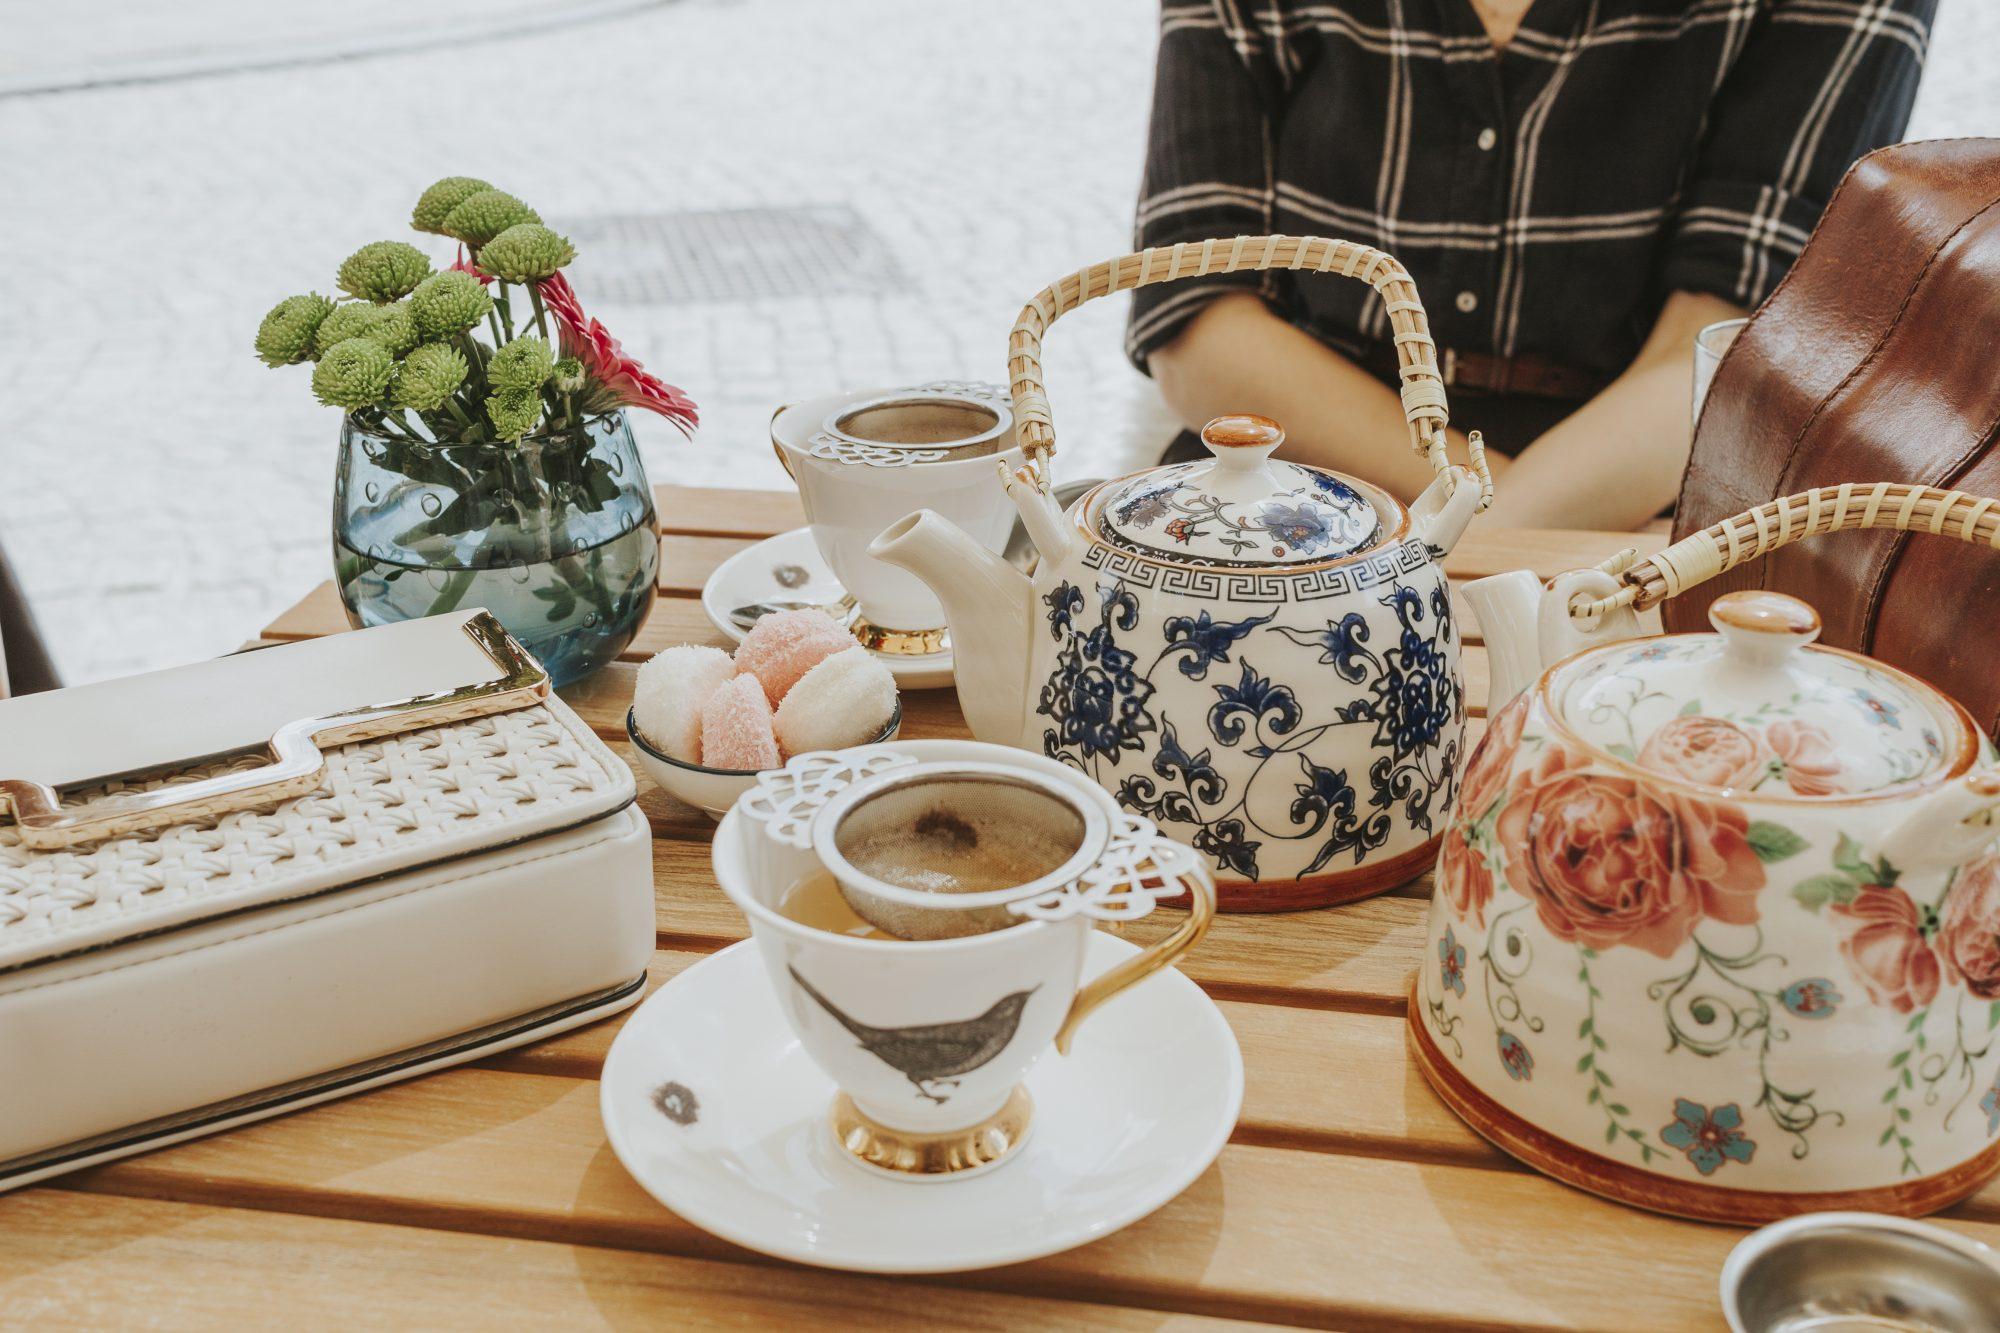 Tea at Blackbird Tea Room, Bruges